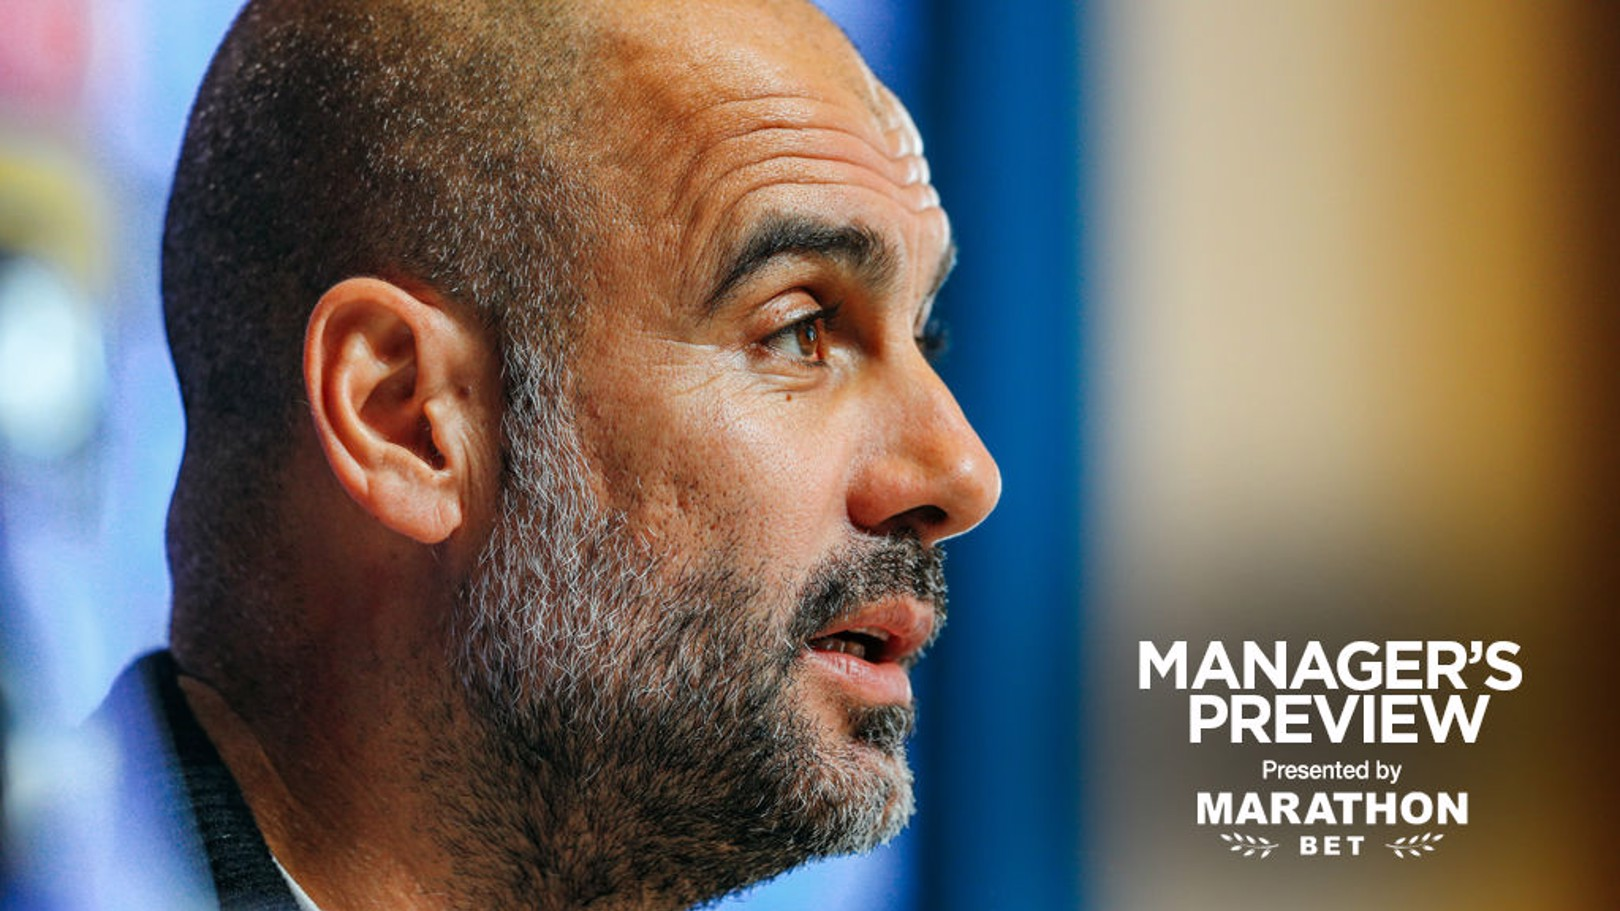 PREVIEW: Pep Guardiola.